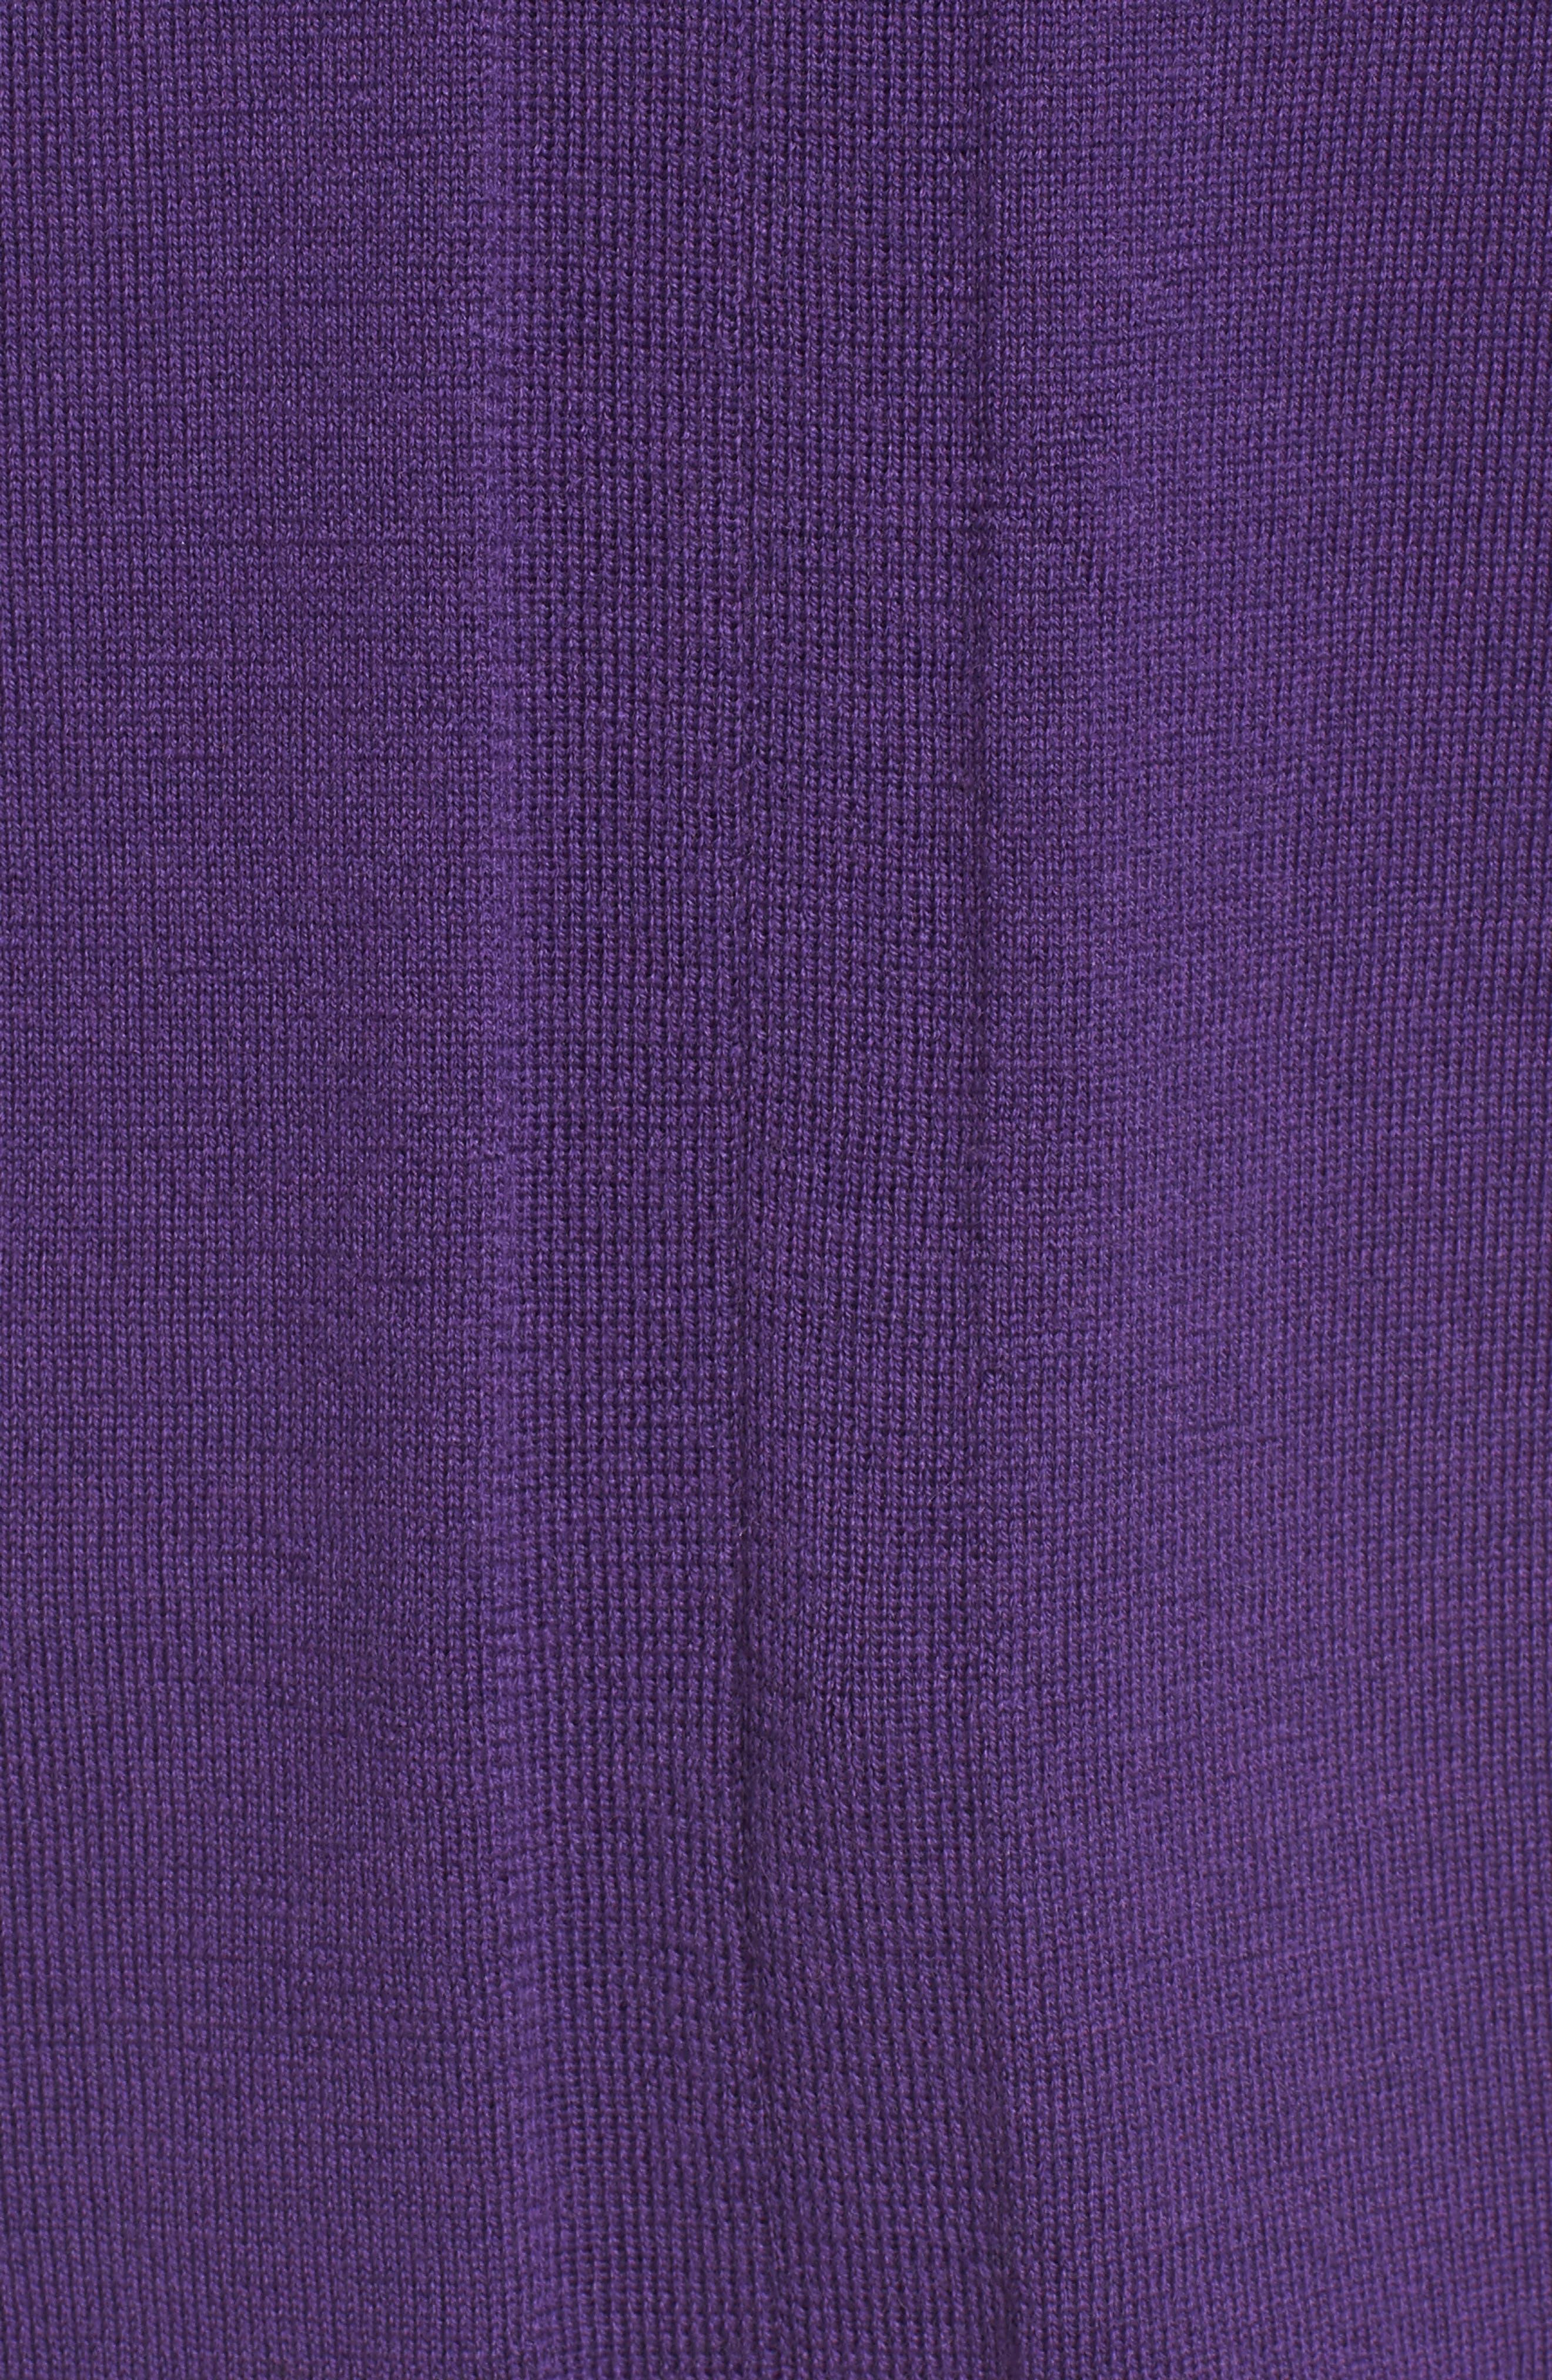 Merino Wool Tunic Sweater,                             Alternate thumbnail 33, color,